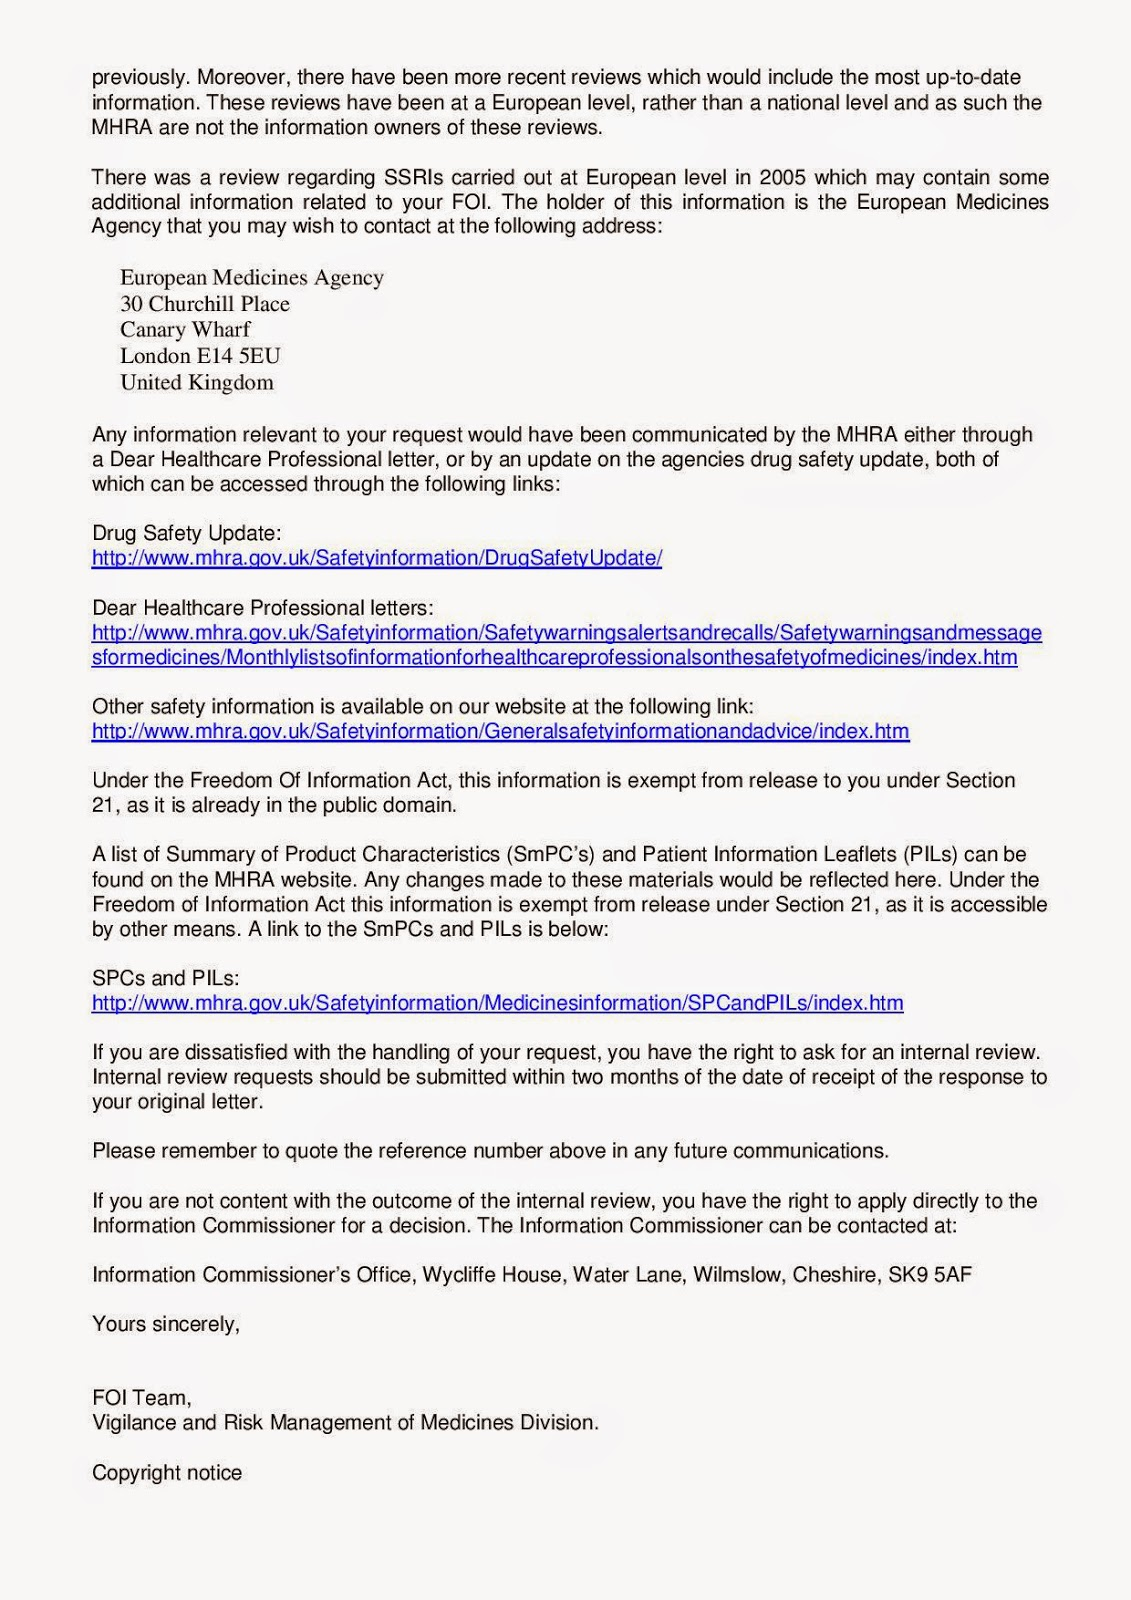 cover letter final paragraph 100 original papers With final paragraph of a cover letter